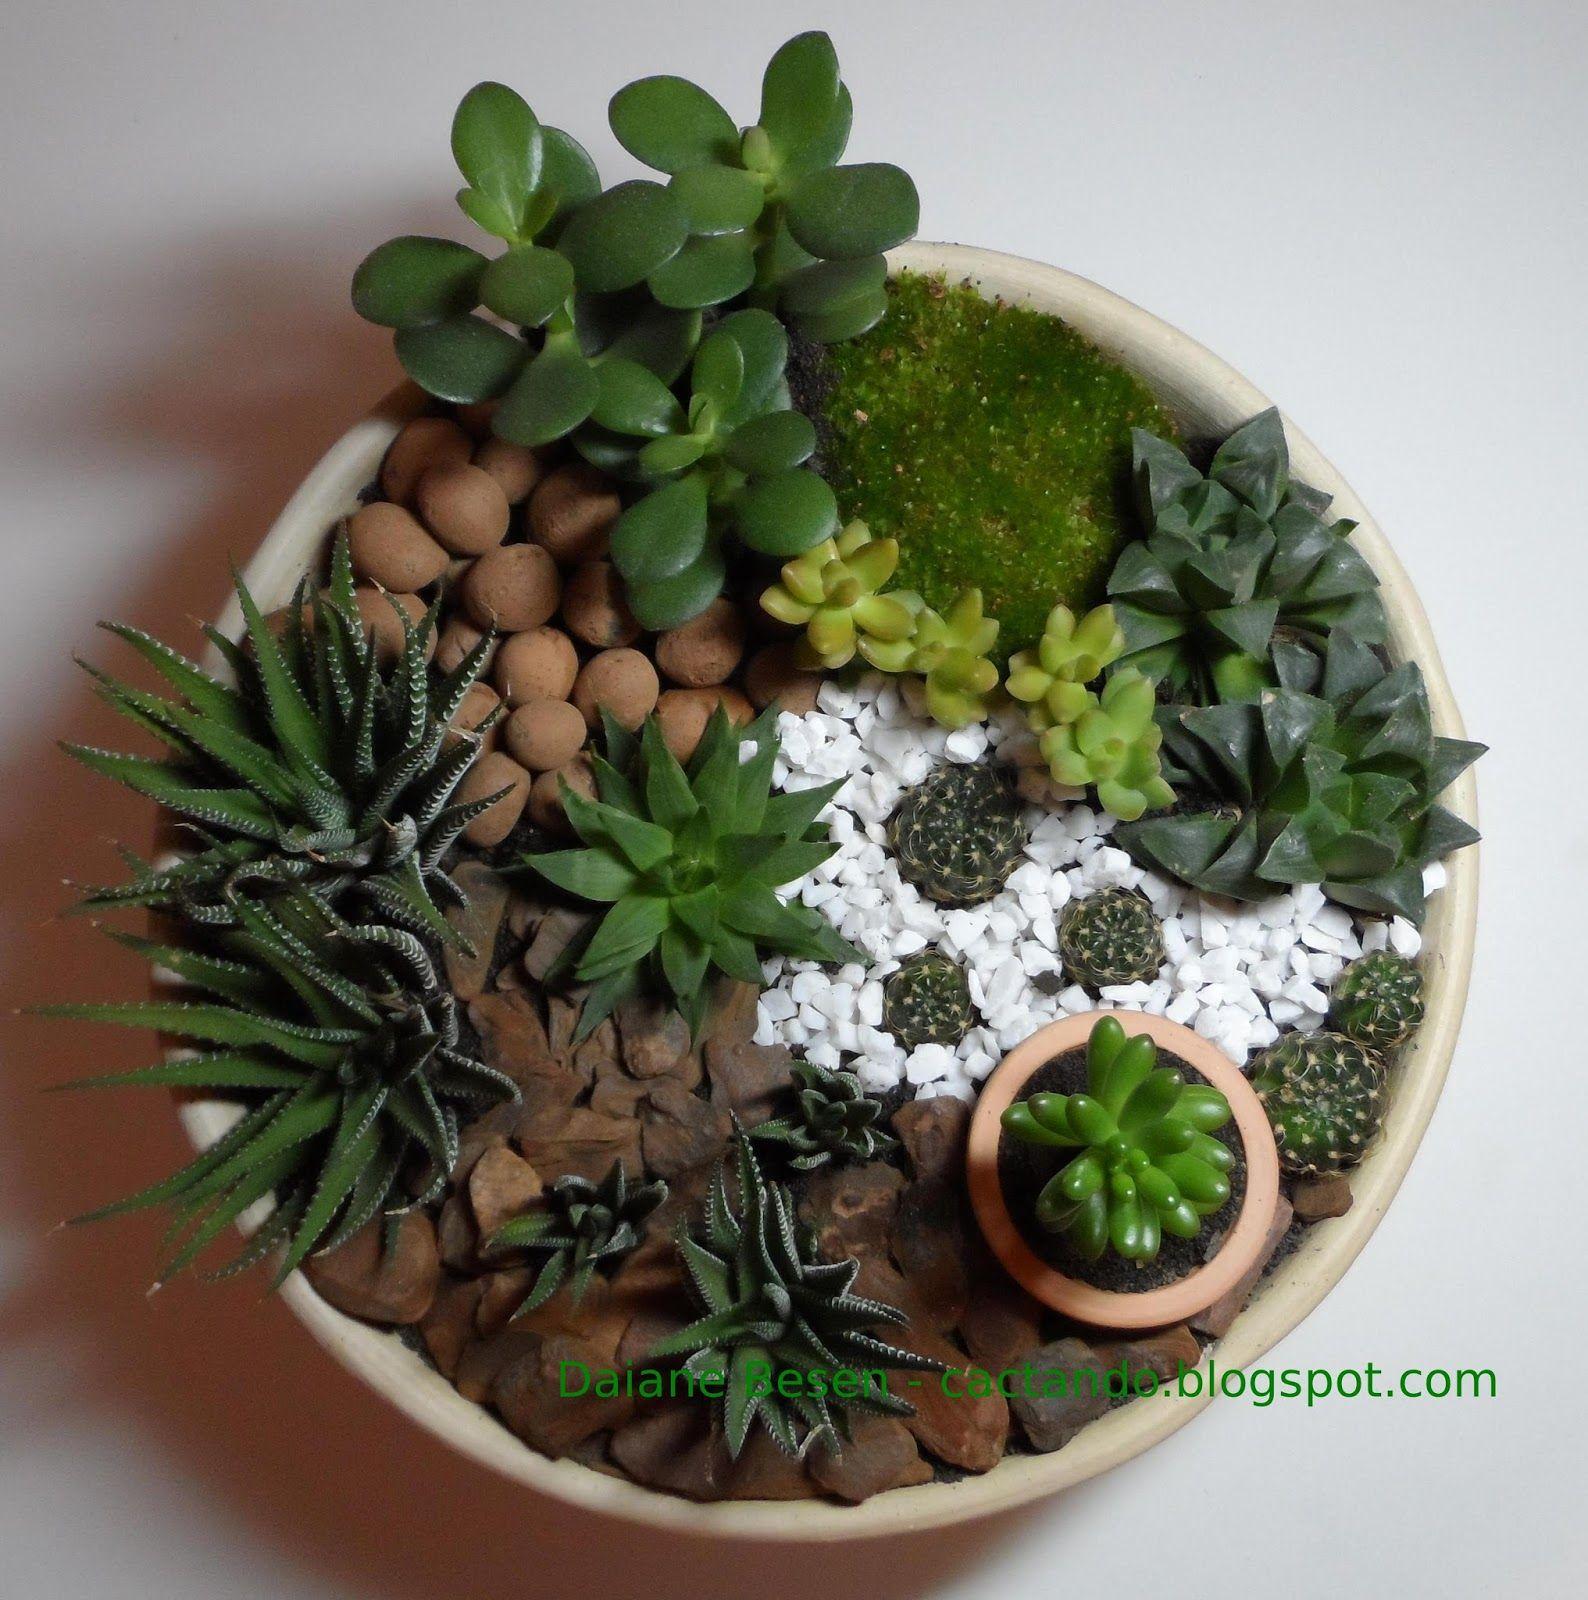 Mini jardim de suculentas e cactus mini garden - Mini plante grasse ...